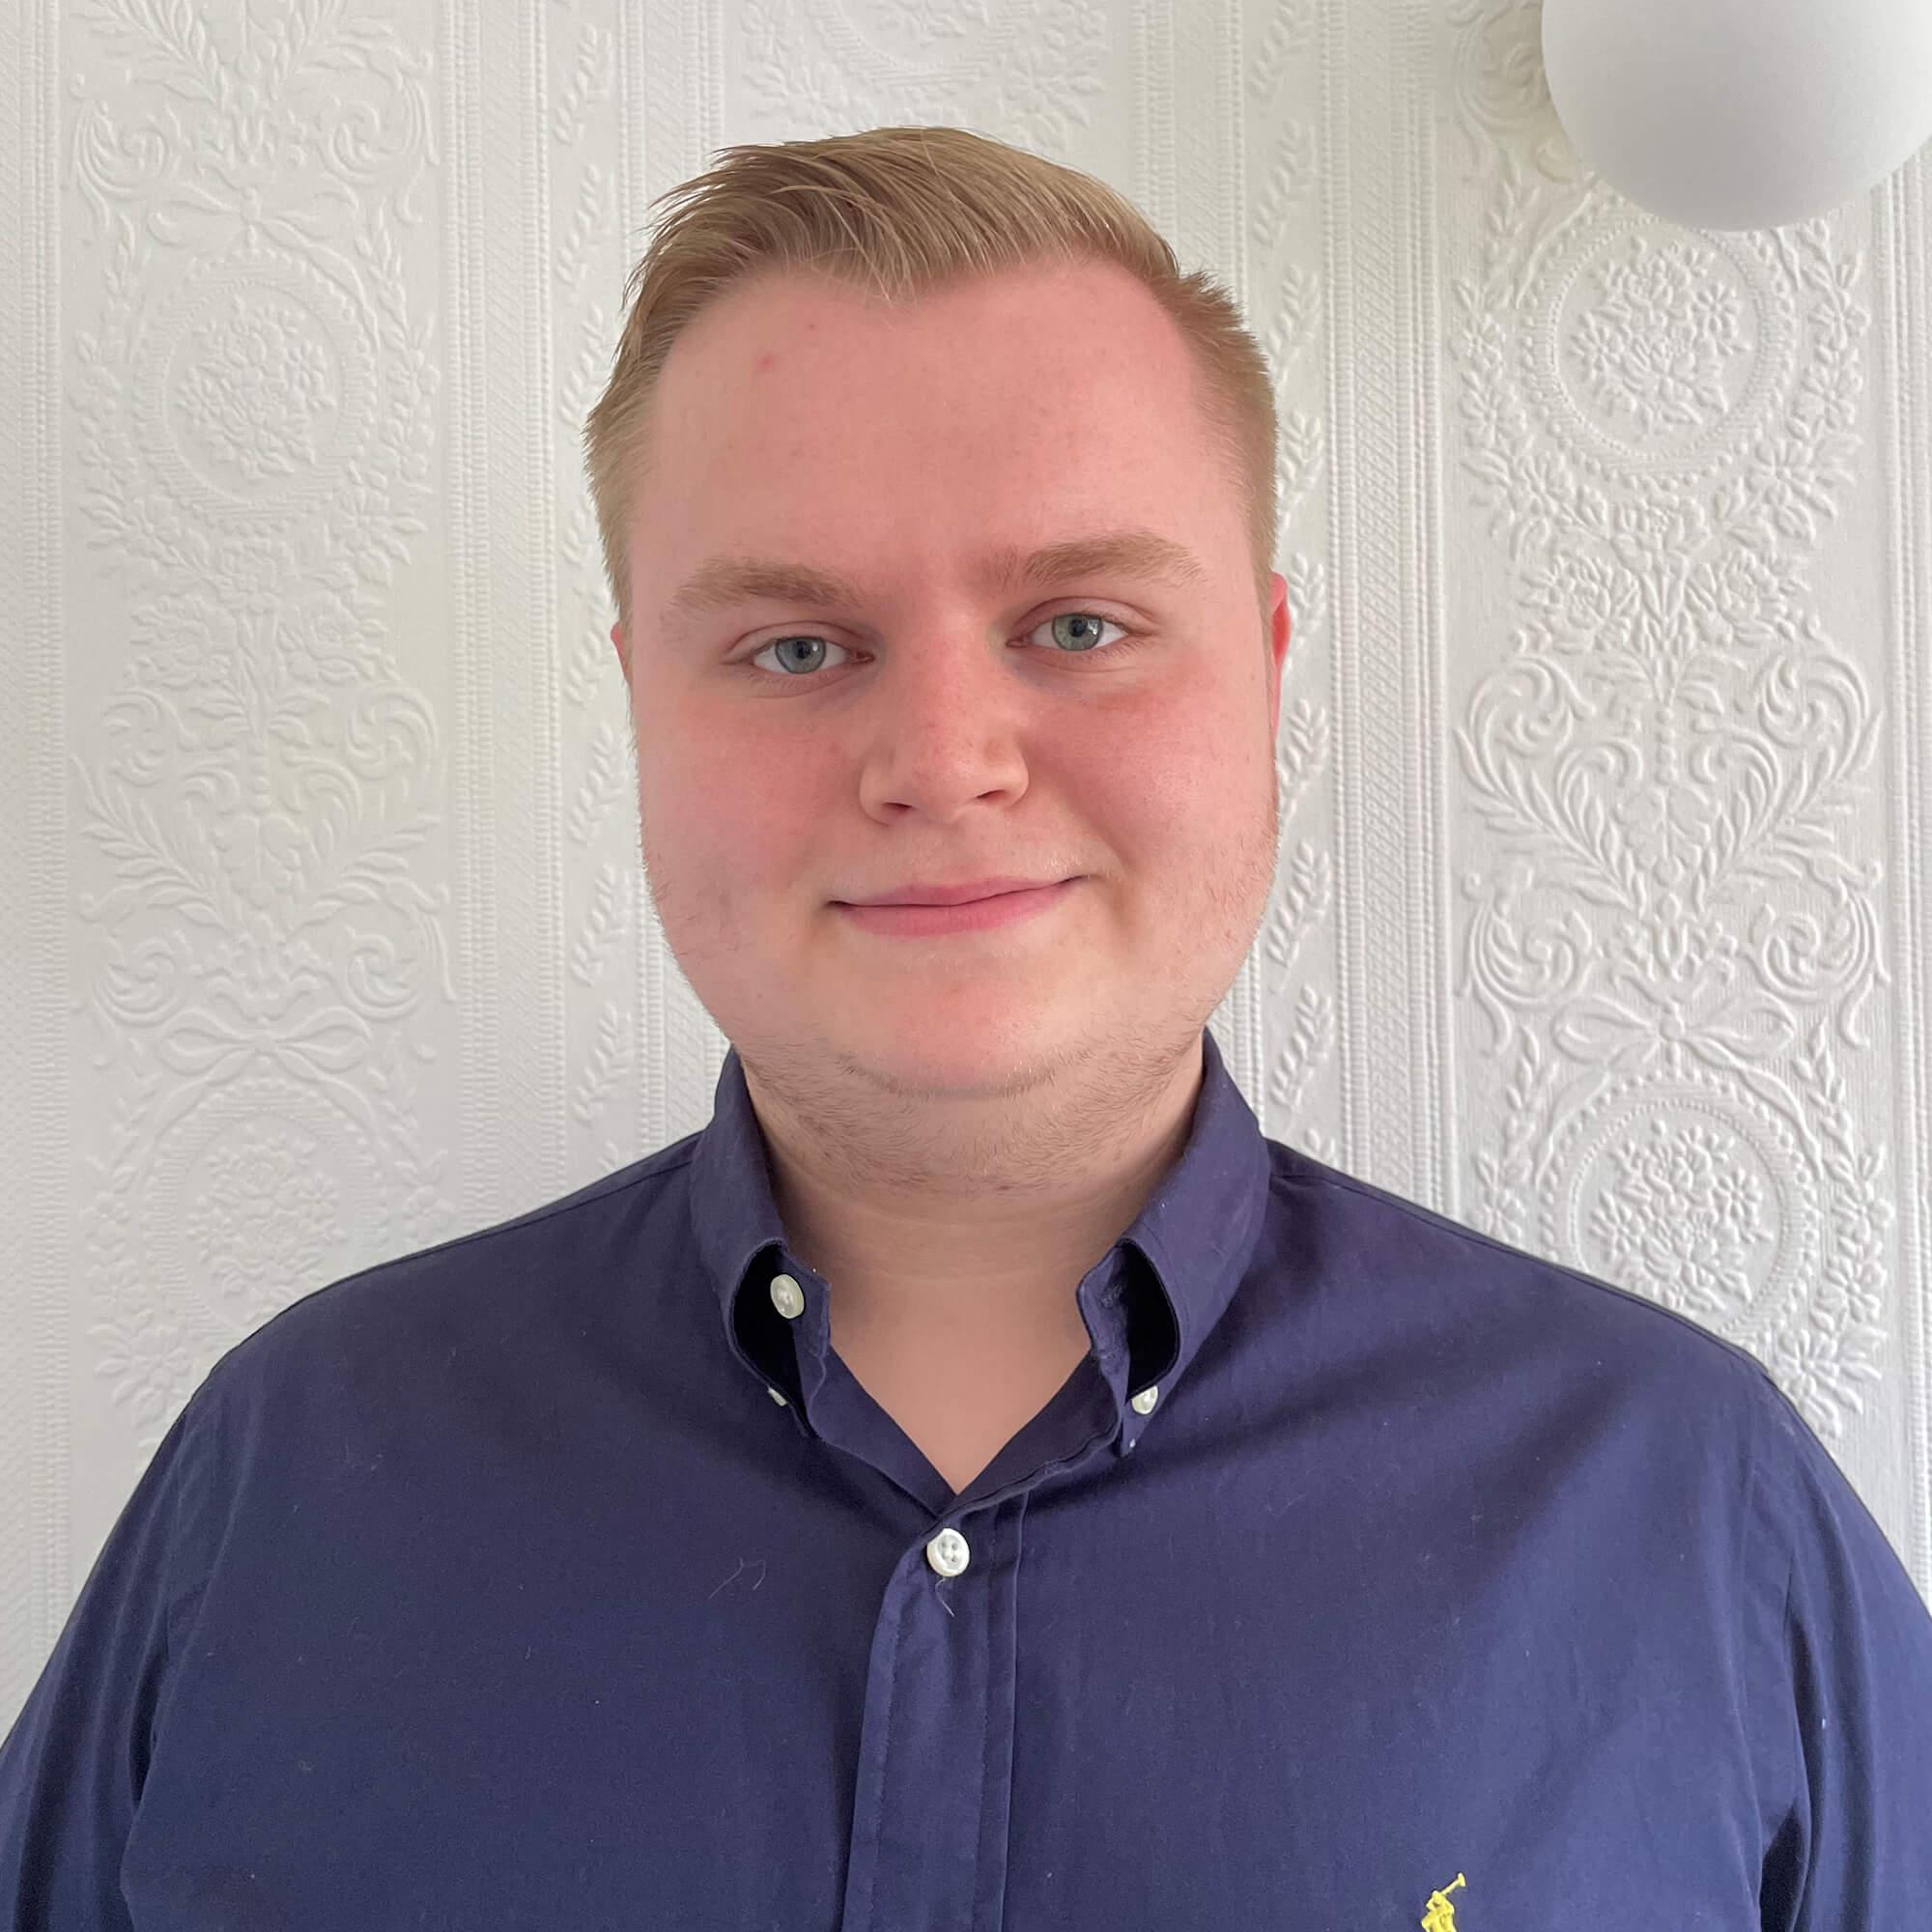 Headshot of Nicholas Bates